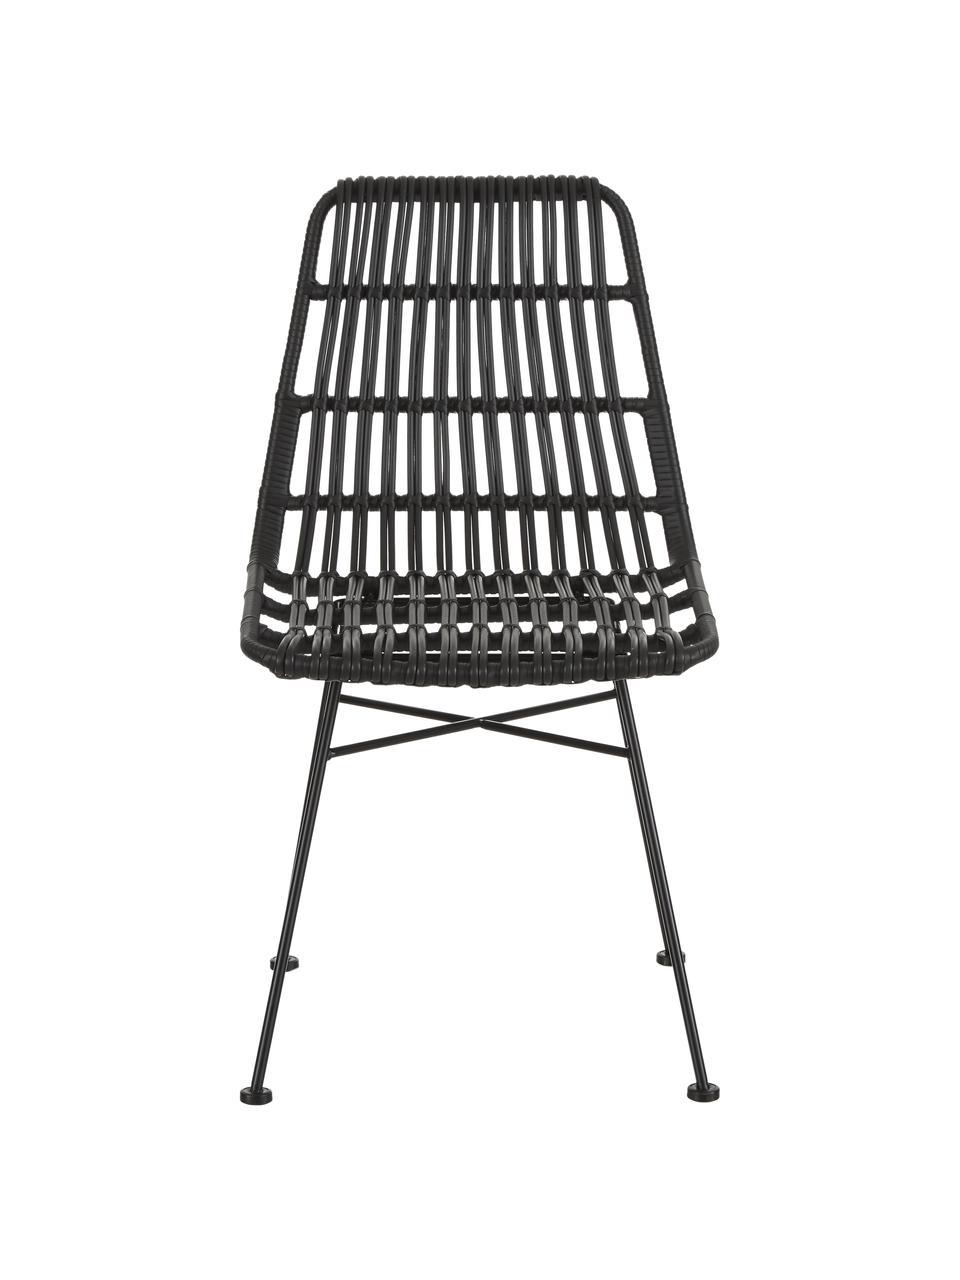 Polyratanová židle Costa, 2 ks, Černá